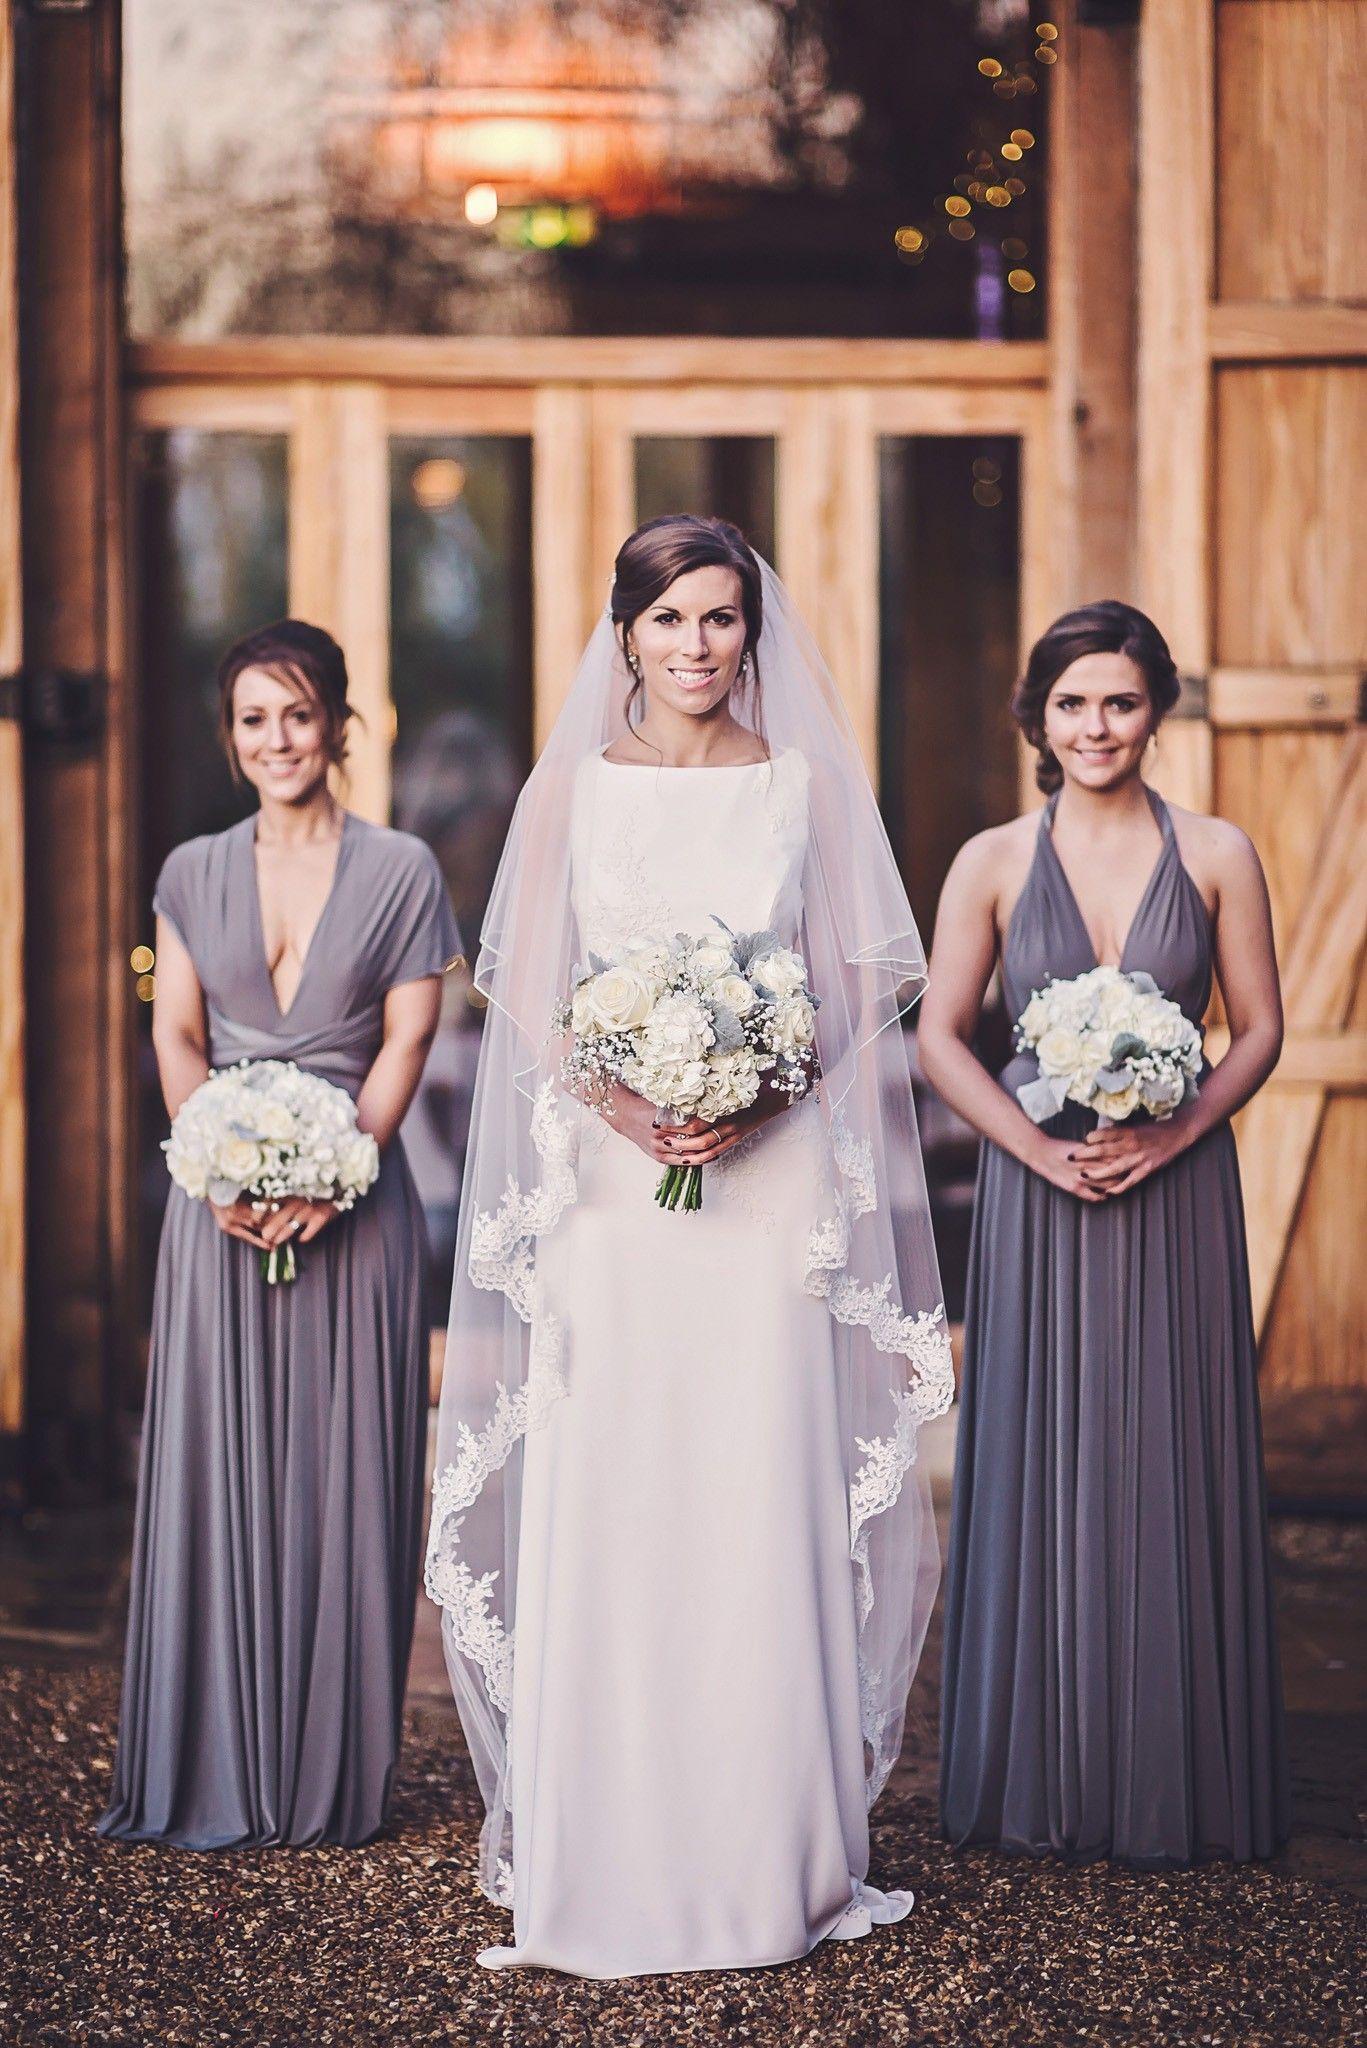 28870848bcd7 Gorgeous deep purple/grey bridesmaid dresses #bridesmaidideas #weddingideas  #bridesmaiddresses